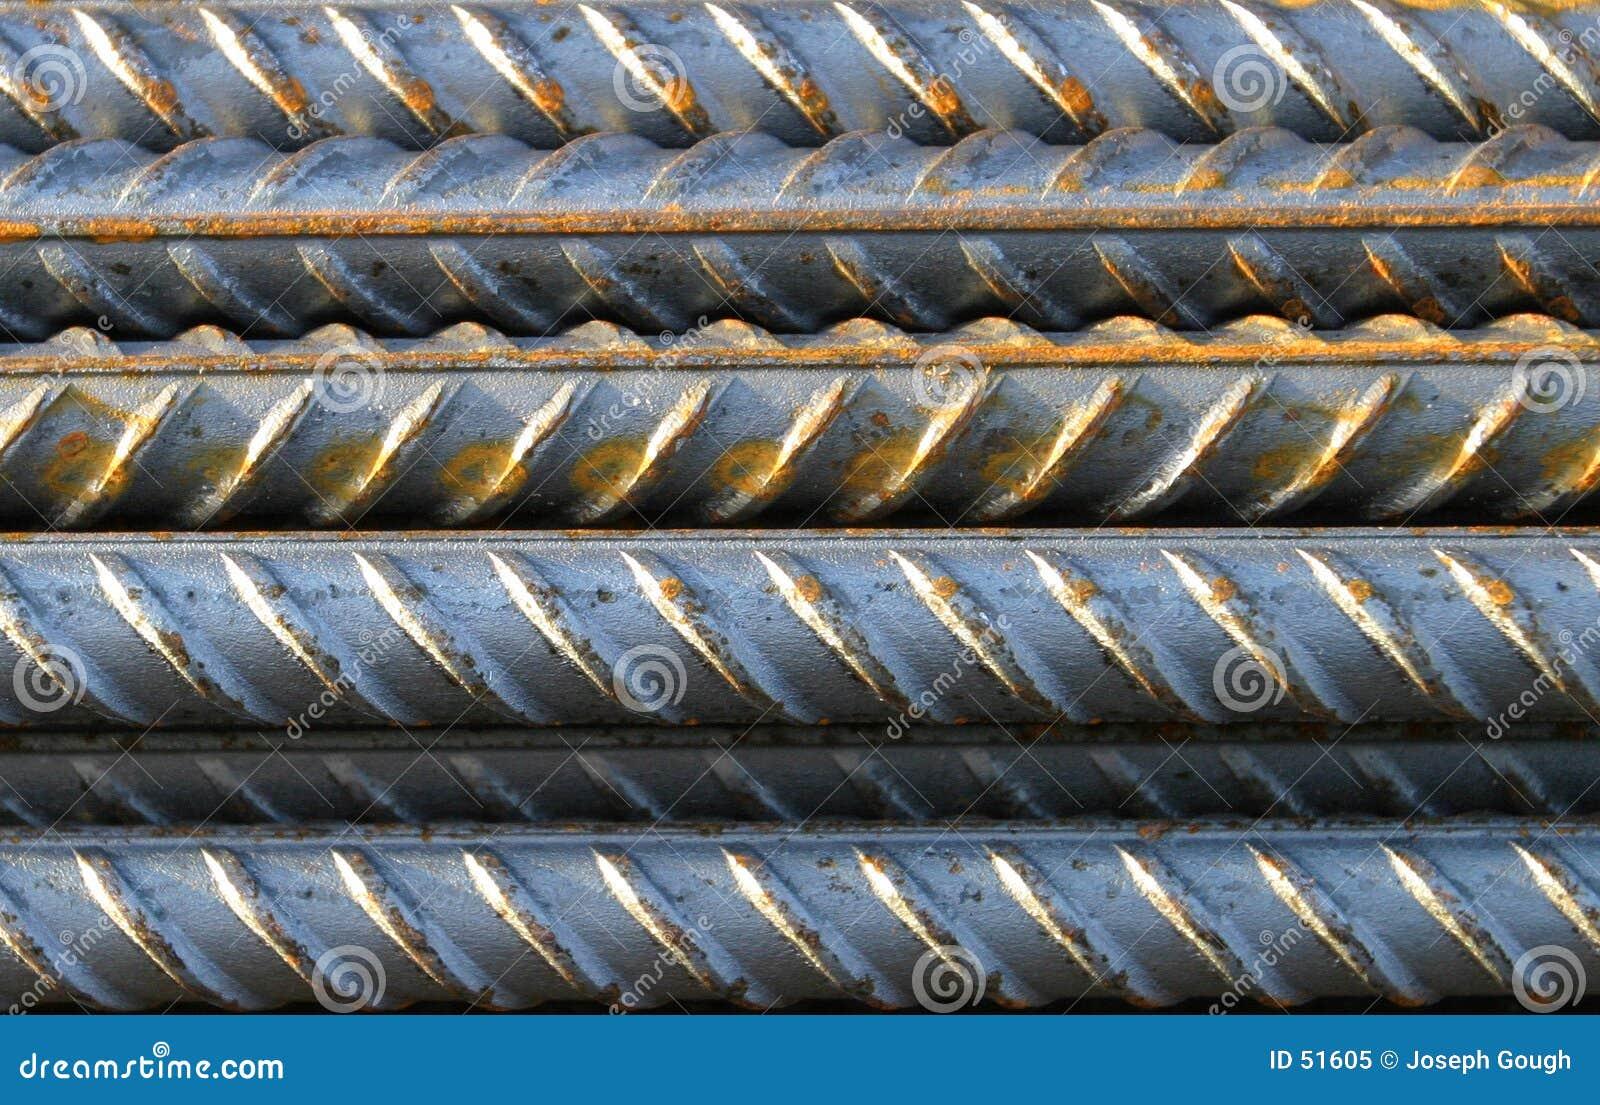 Barre d acciaio 1